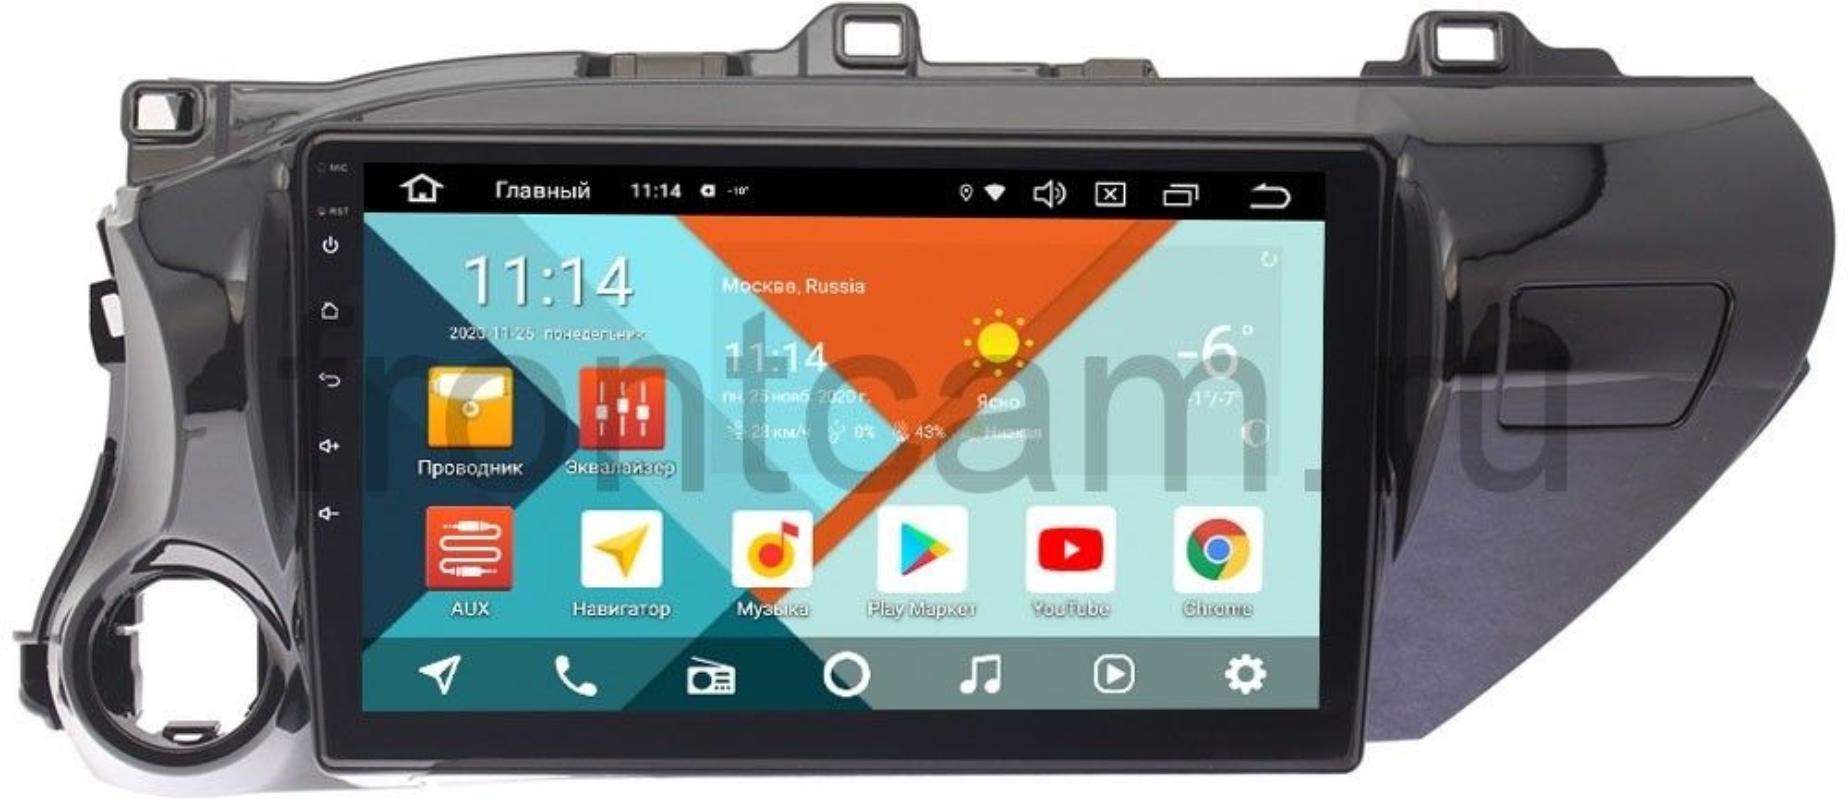 Штатная магнитола Toyota Hilux VIII (для авто без магнитолы)Wide Media KS1071QR-3/32 DSP CarPlay 4G-SIM на Android 10 (+ Камера заднего вида в подарок!)